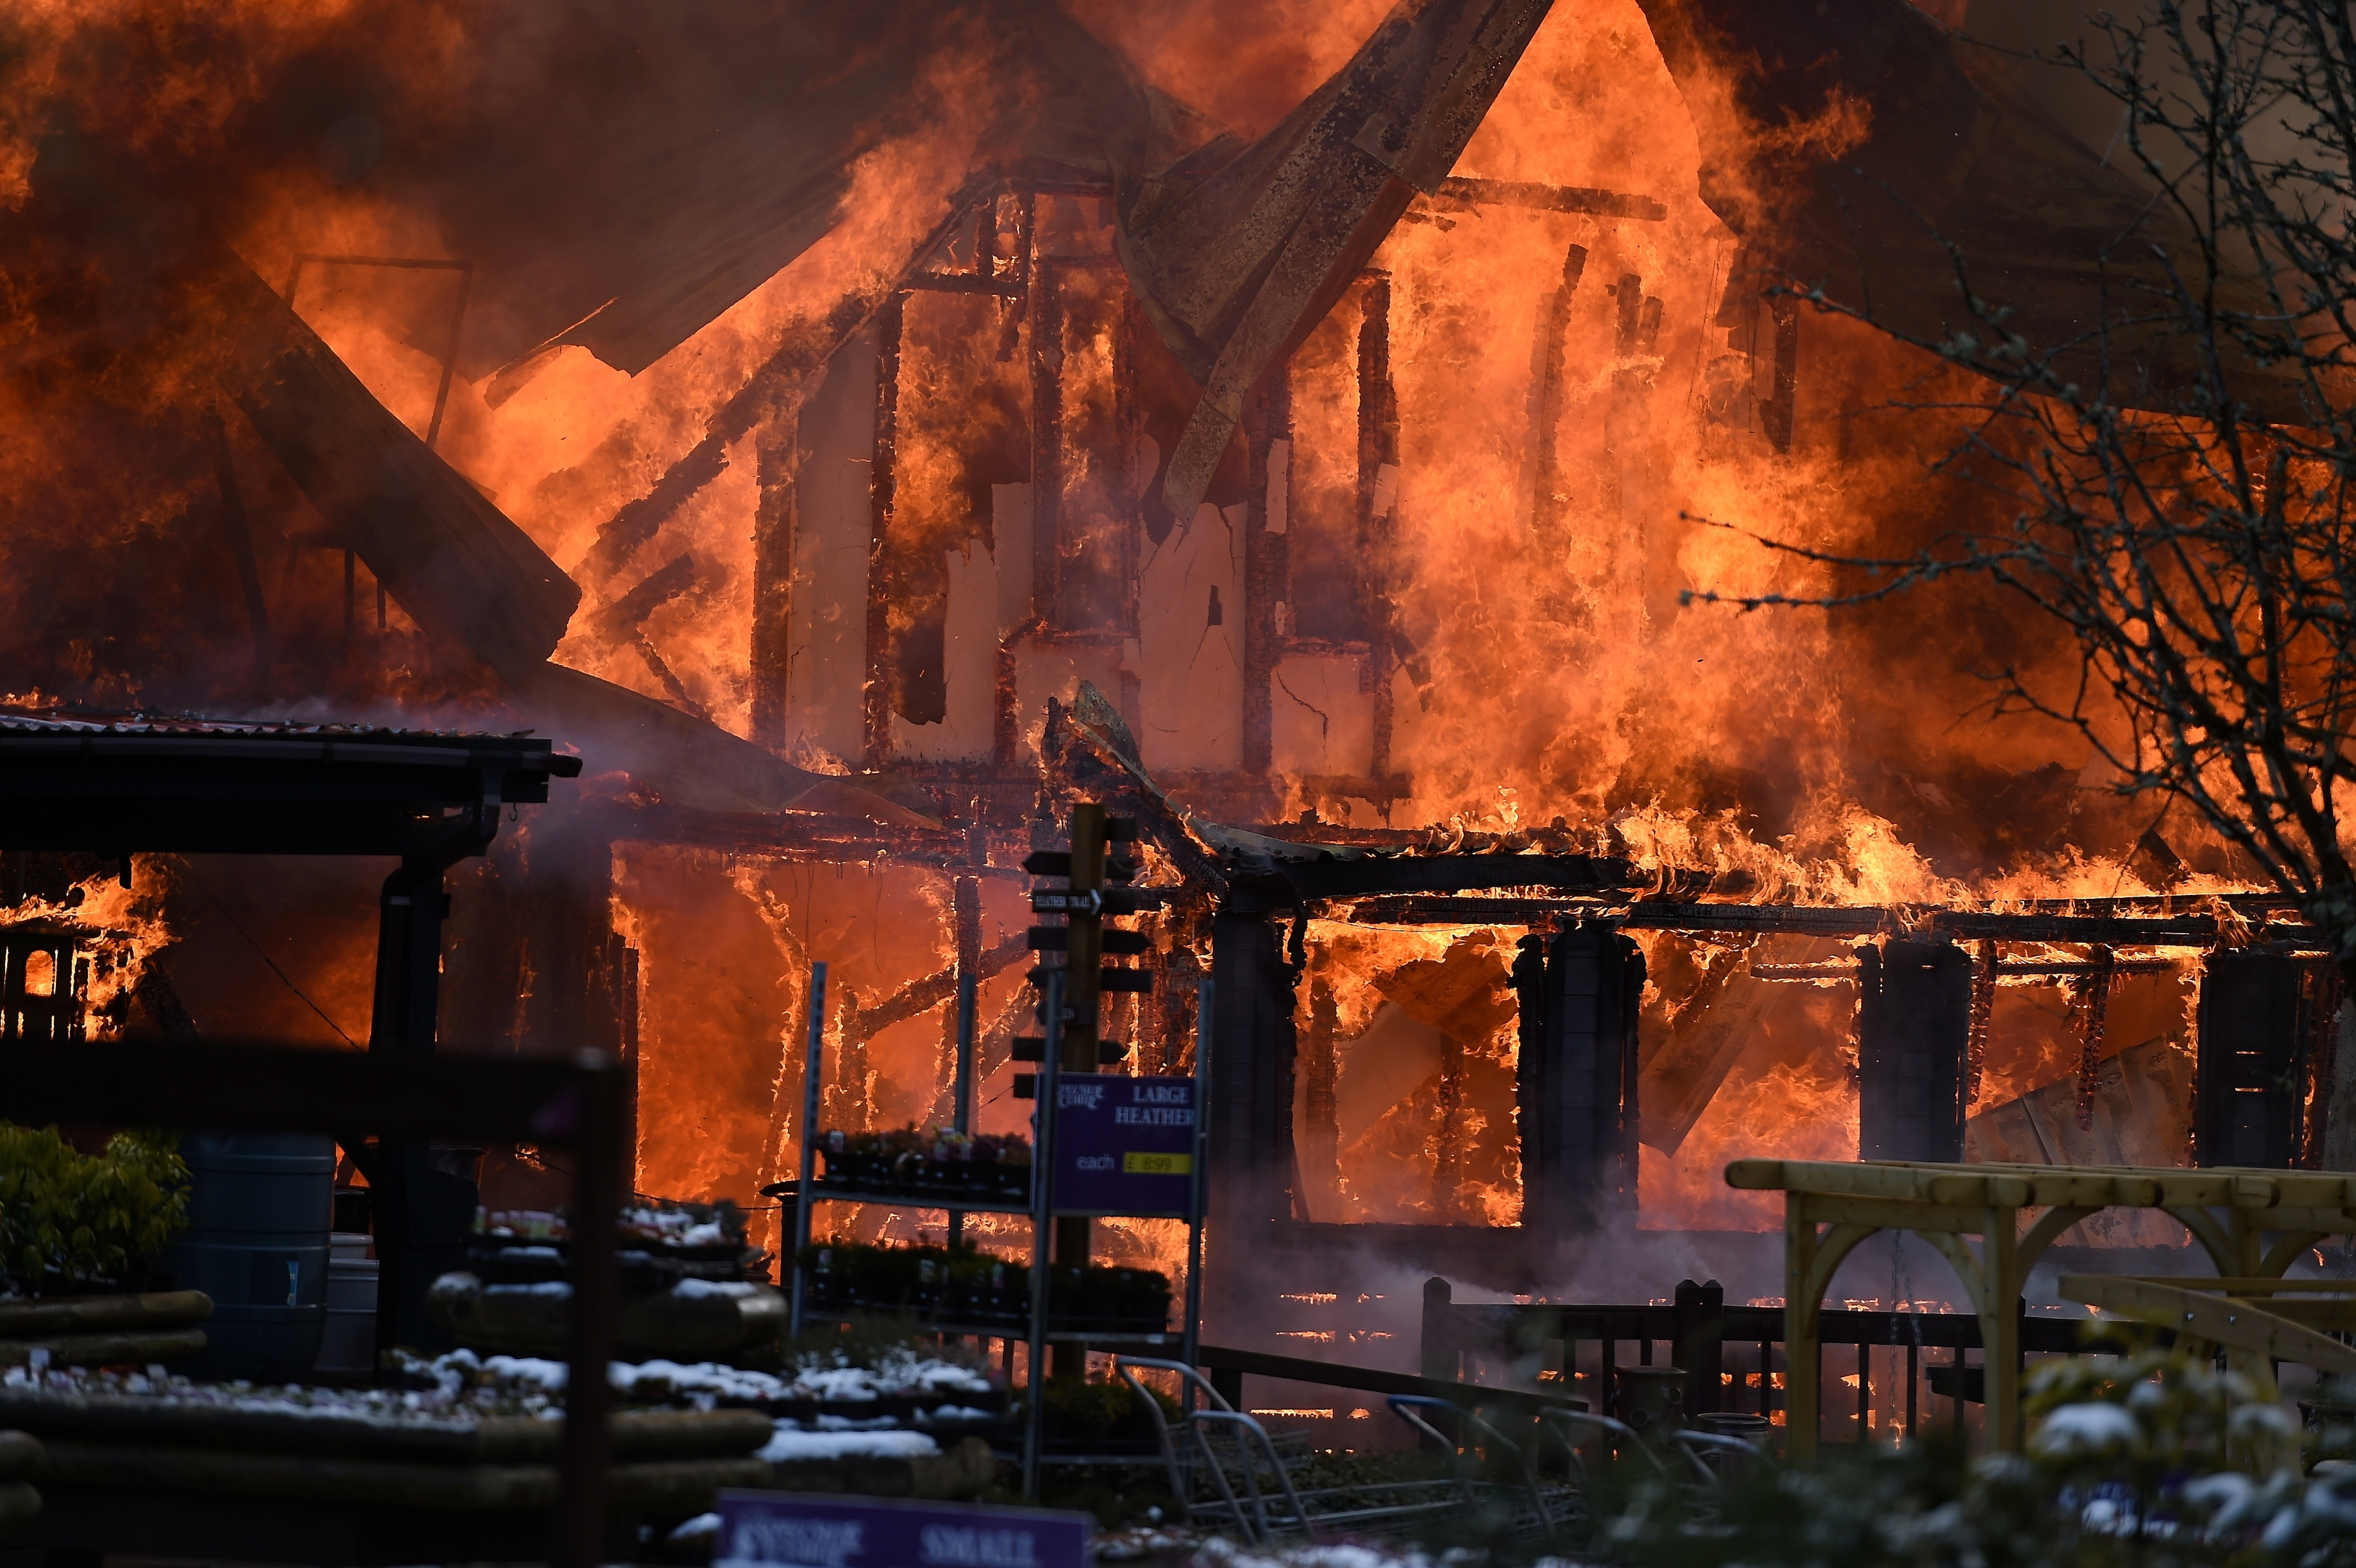 FIre crews battle huge fire at Speyside Heather Centre